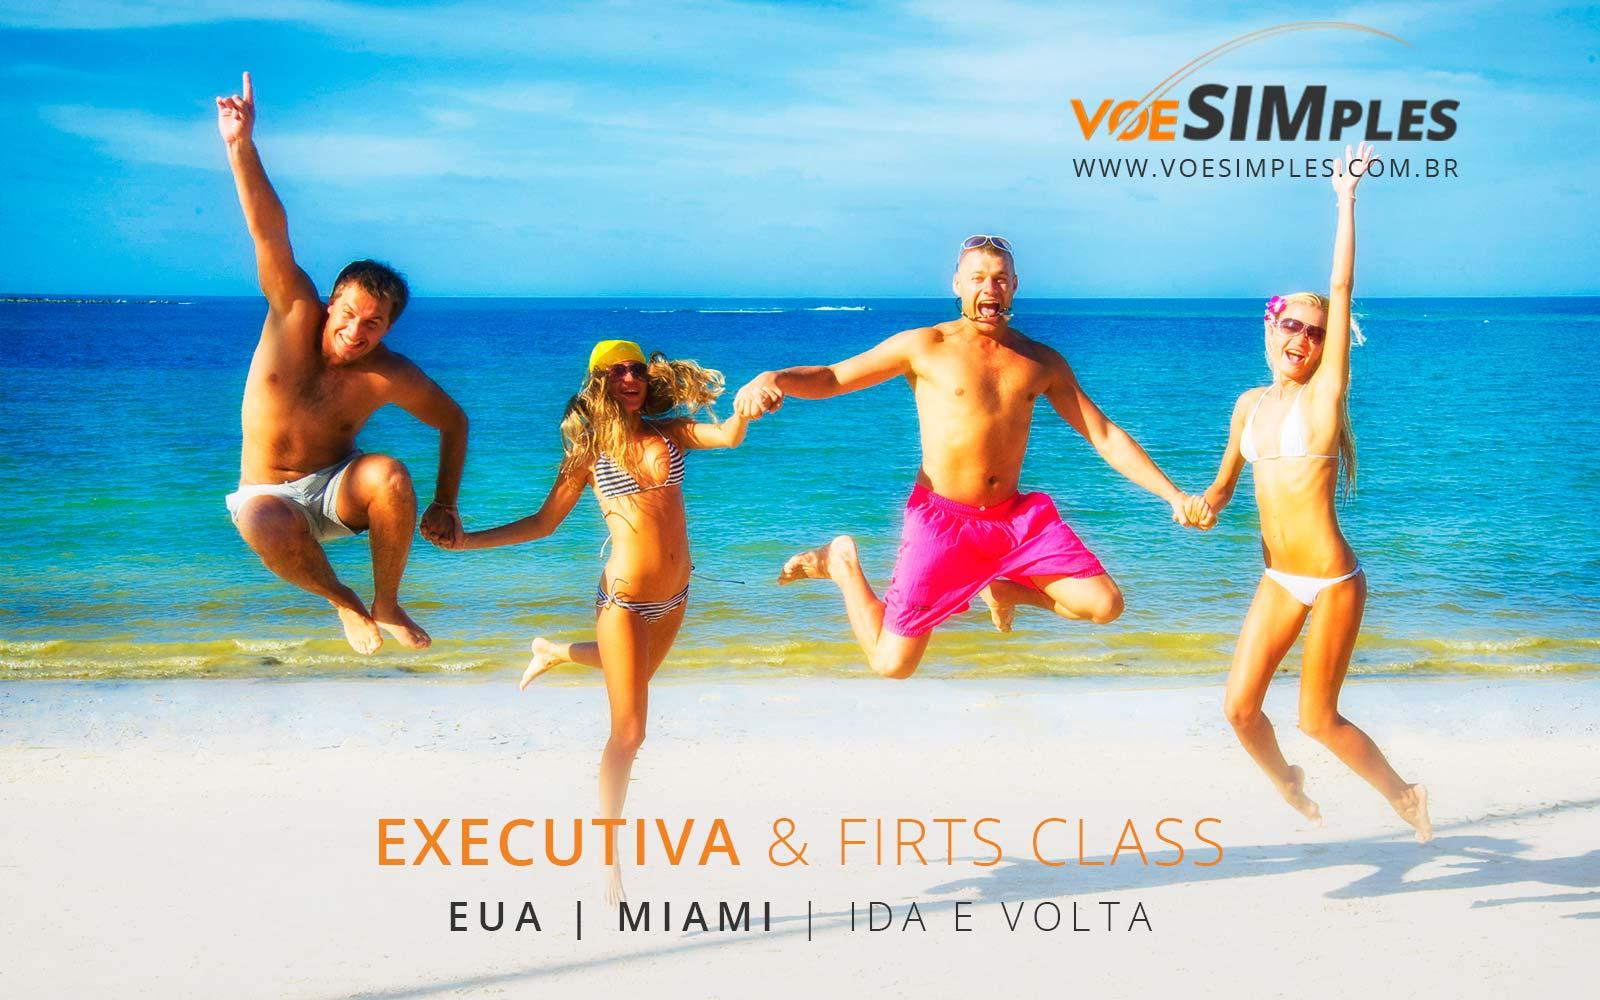 Passagens promo na Classe Executiva para Miami